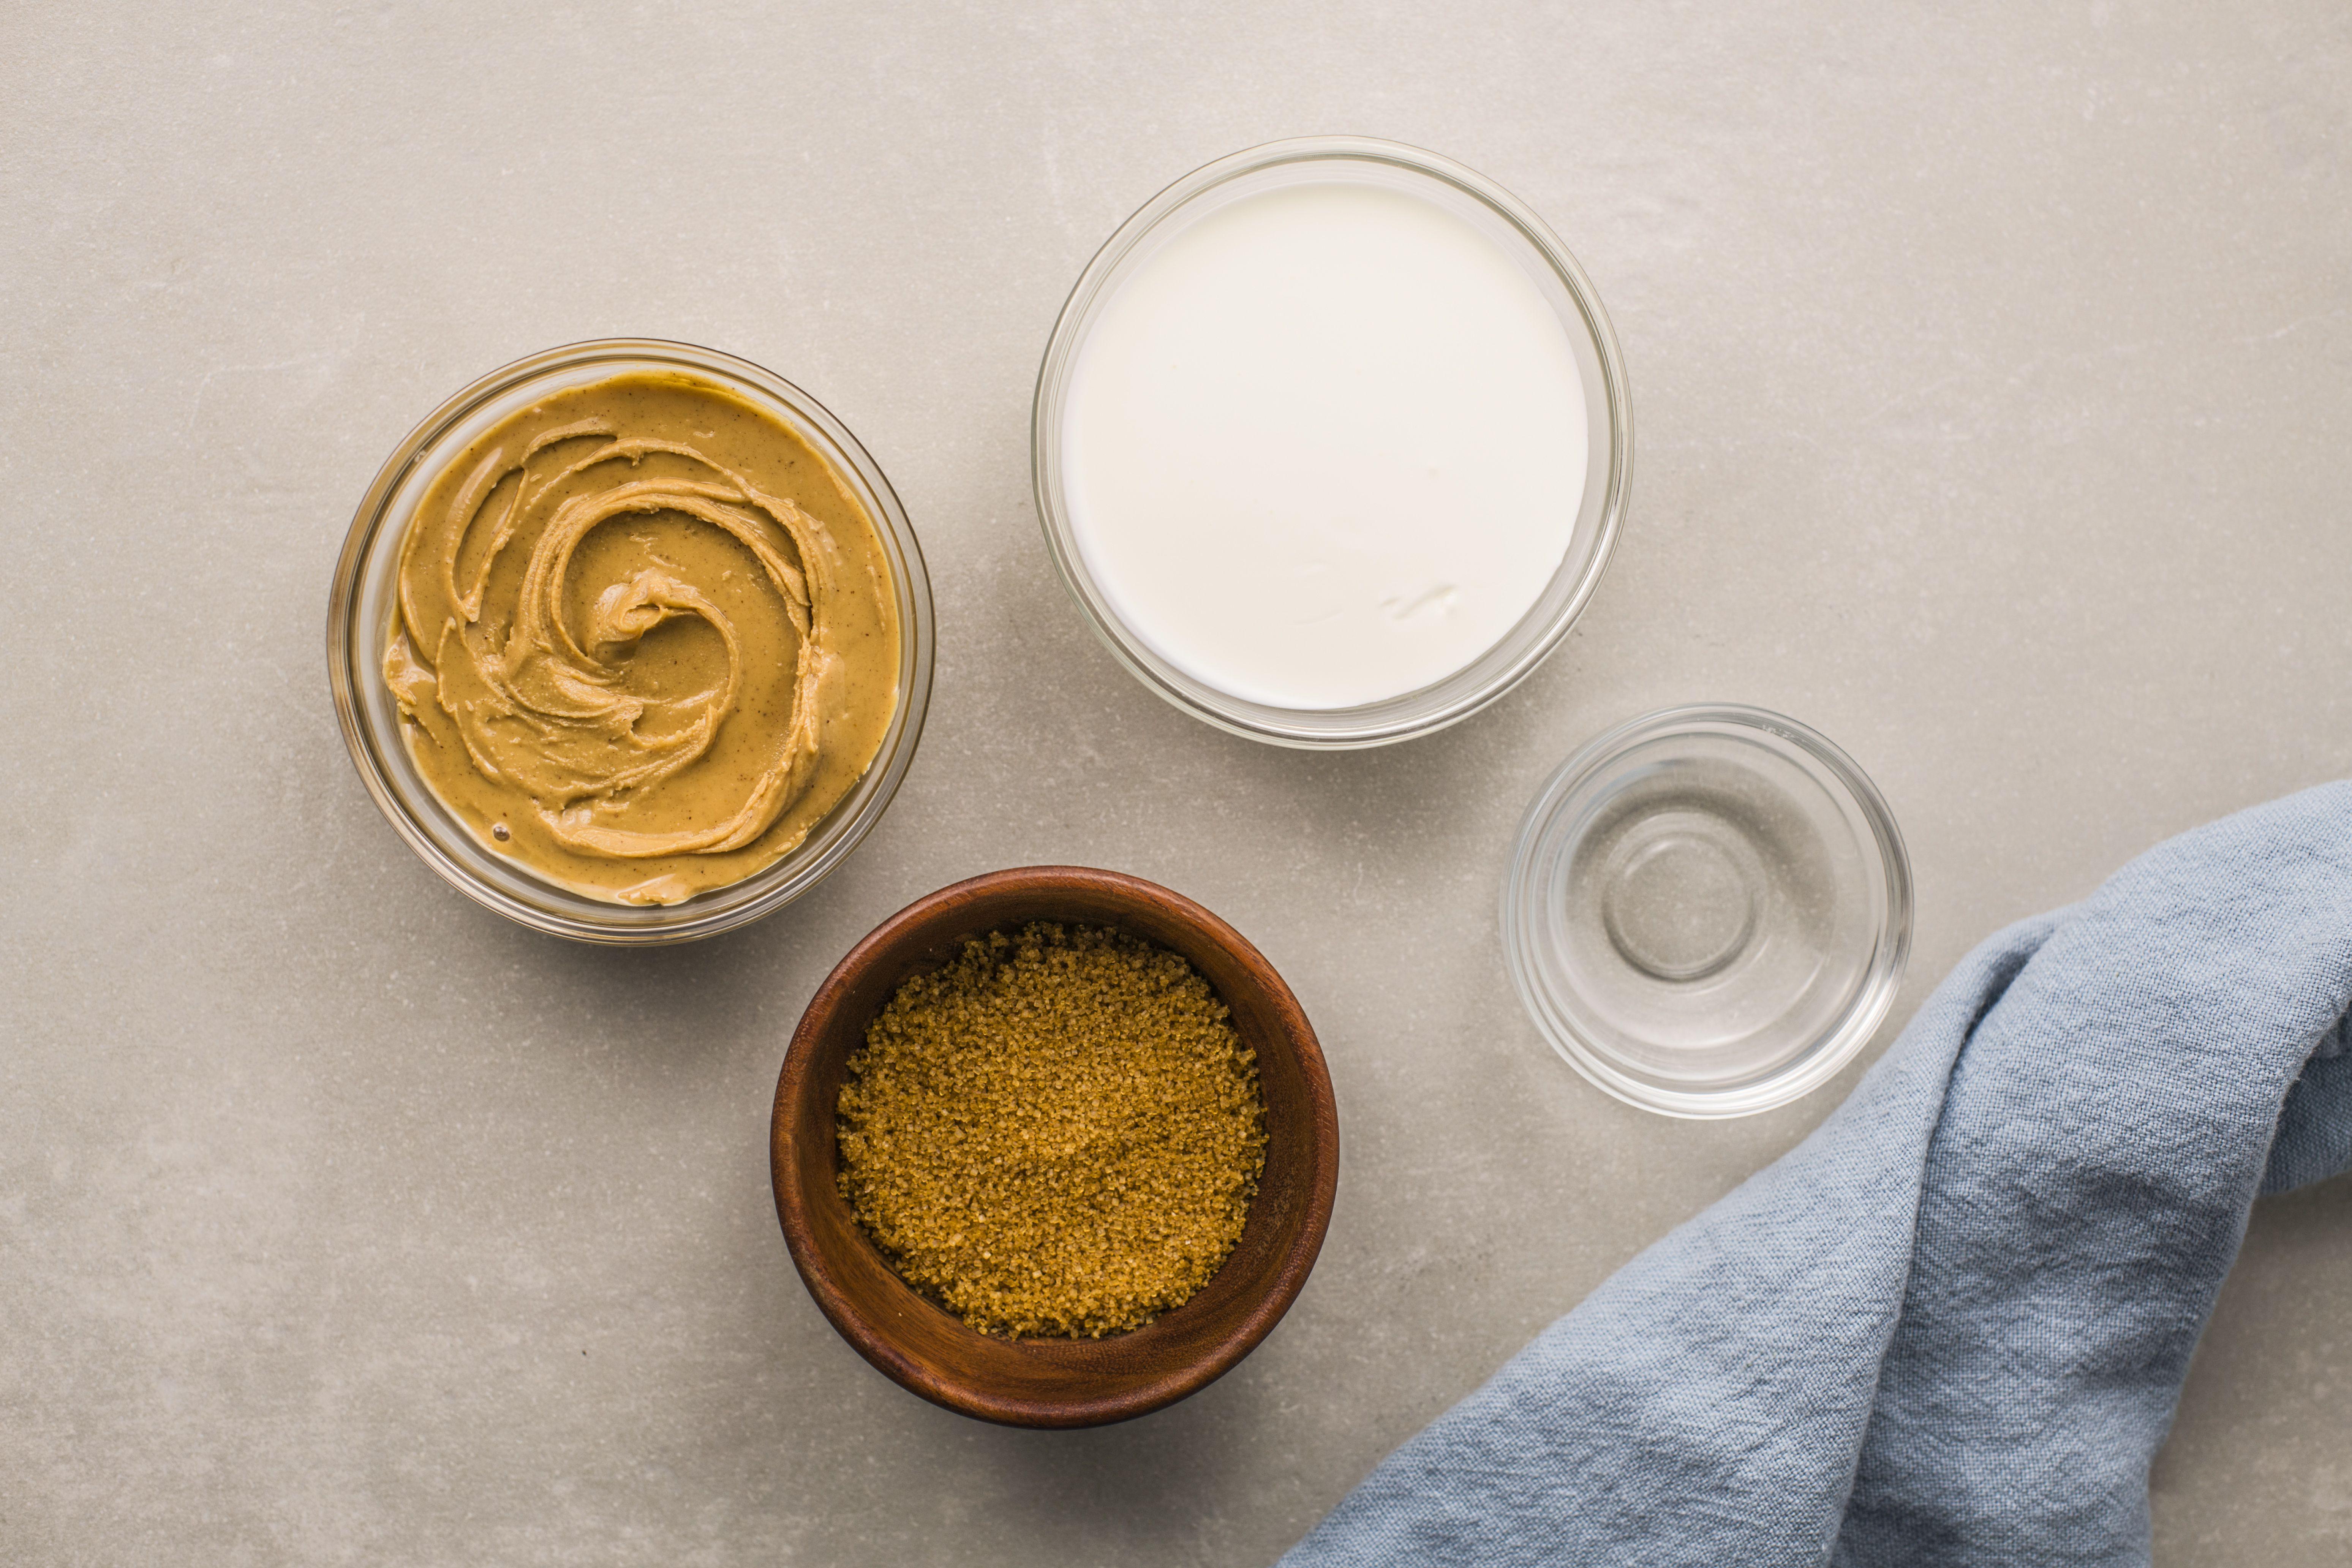 Peanut butter sauce ingredients